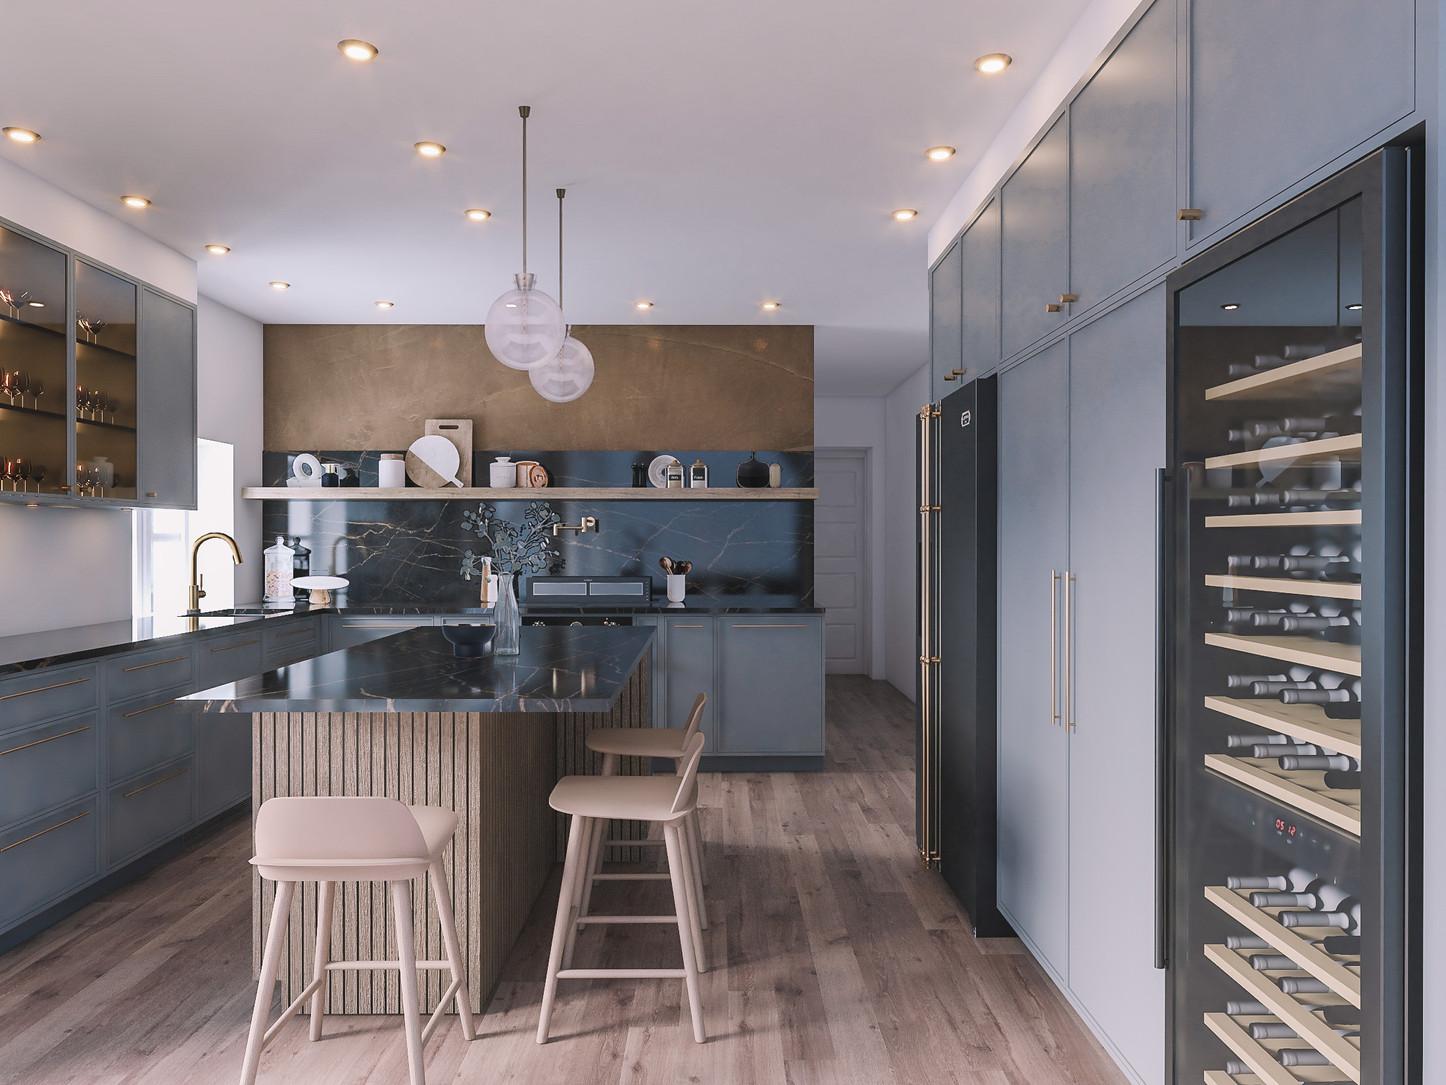 Interior_design_kitchen_1_contemporary_s